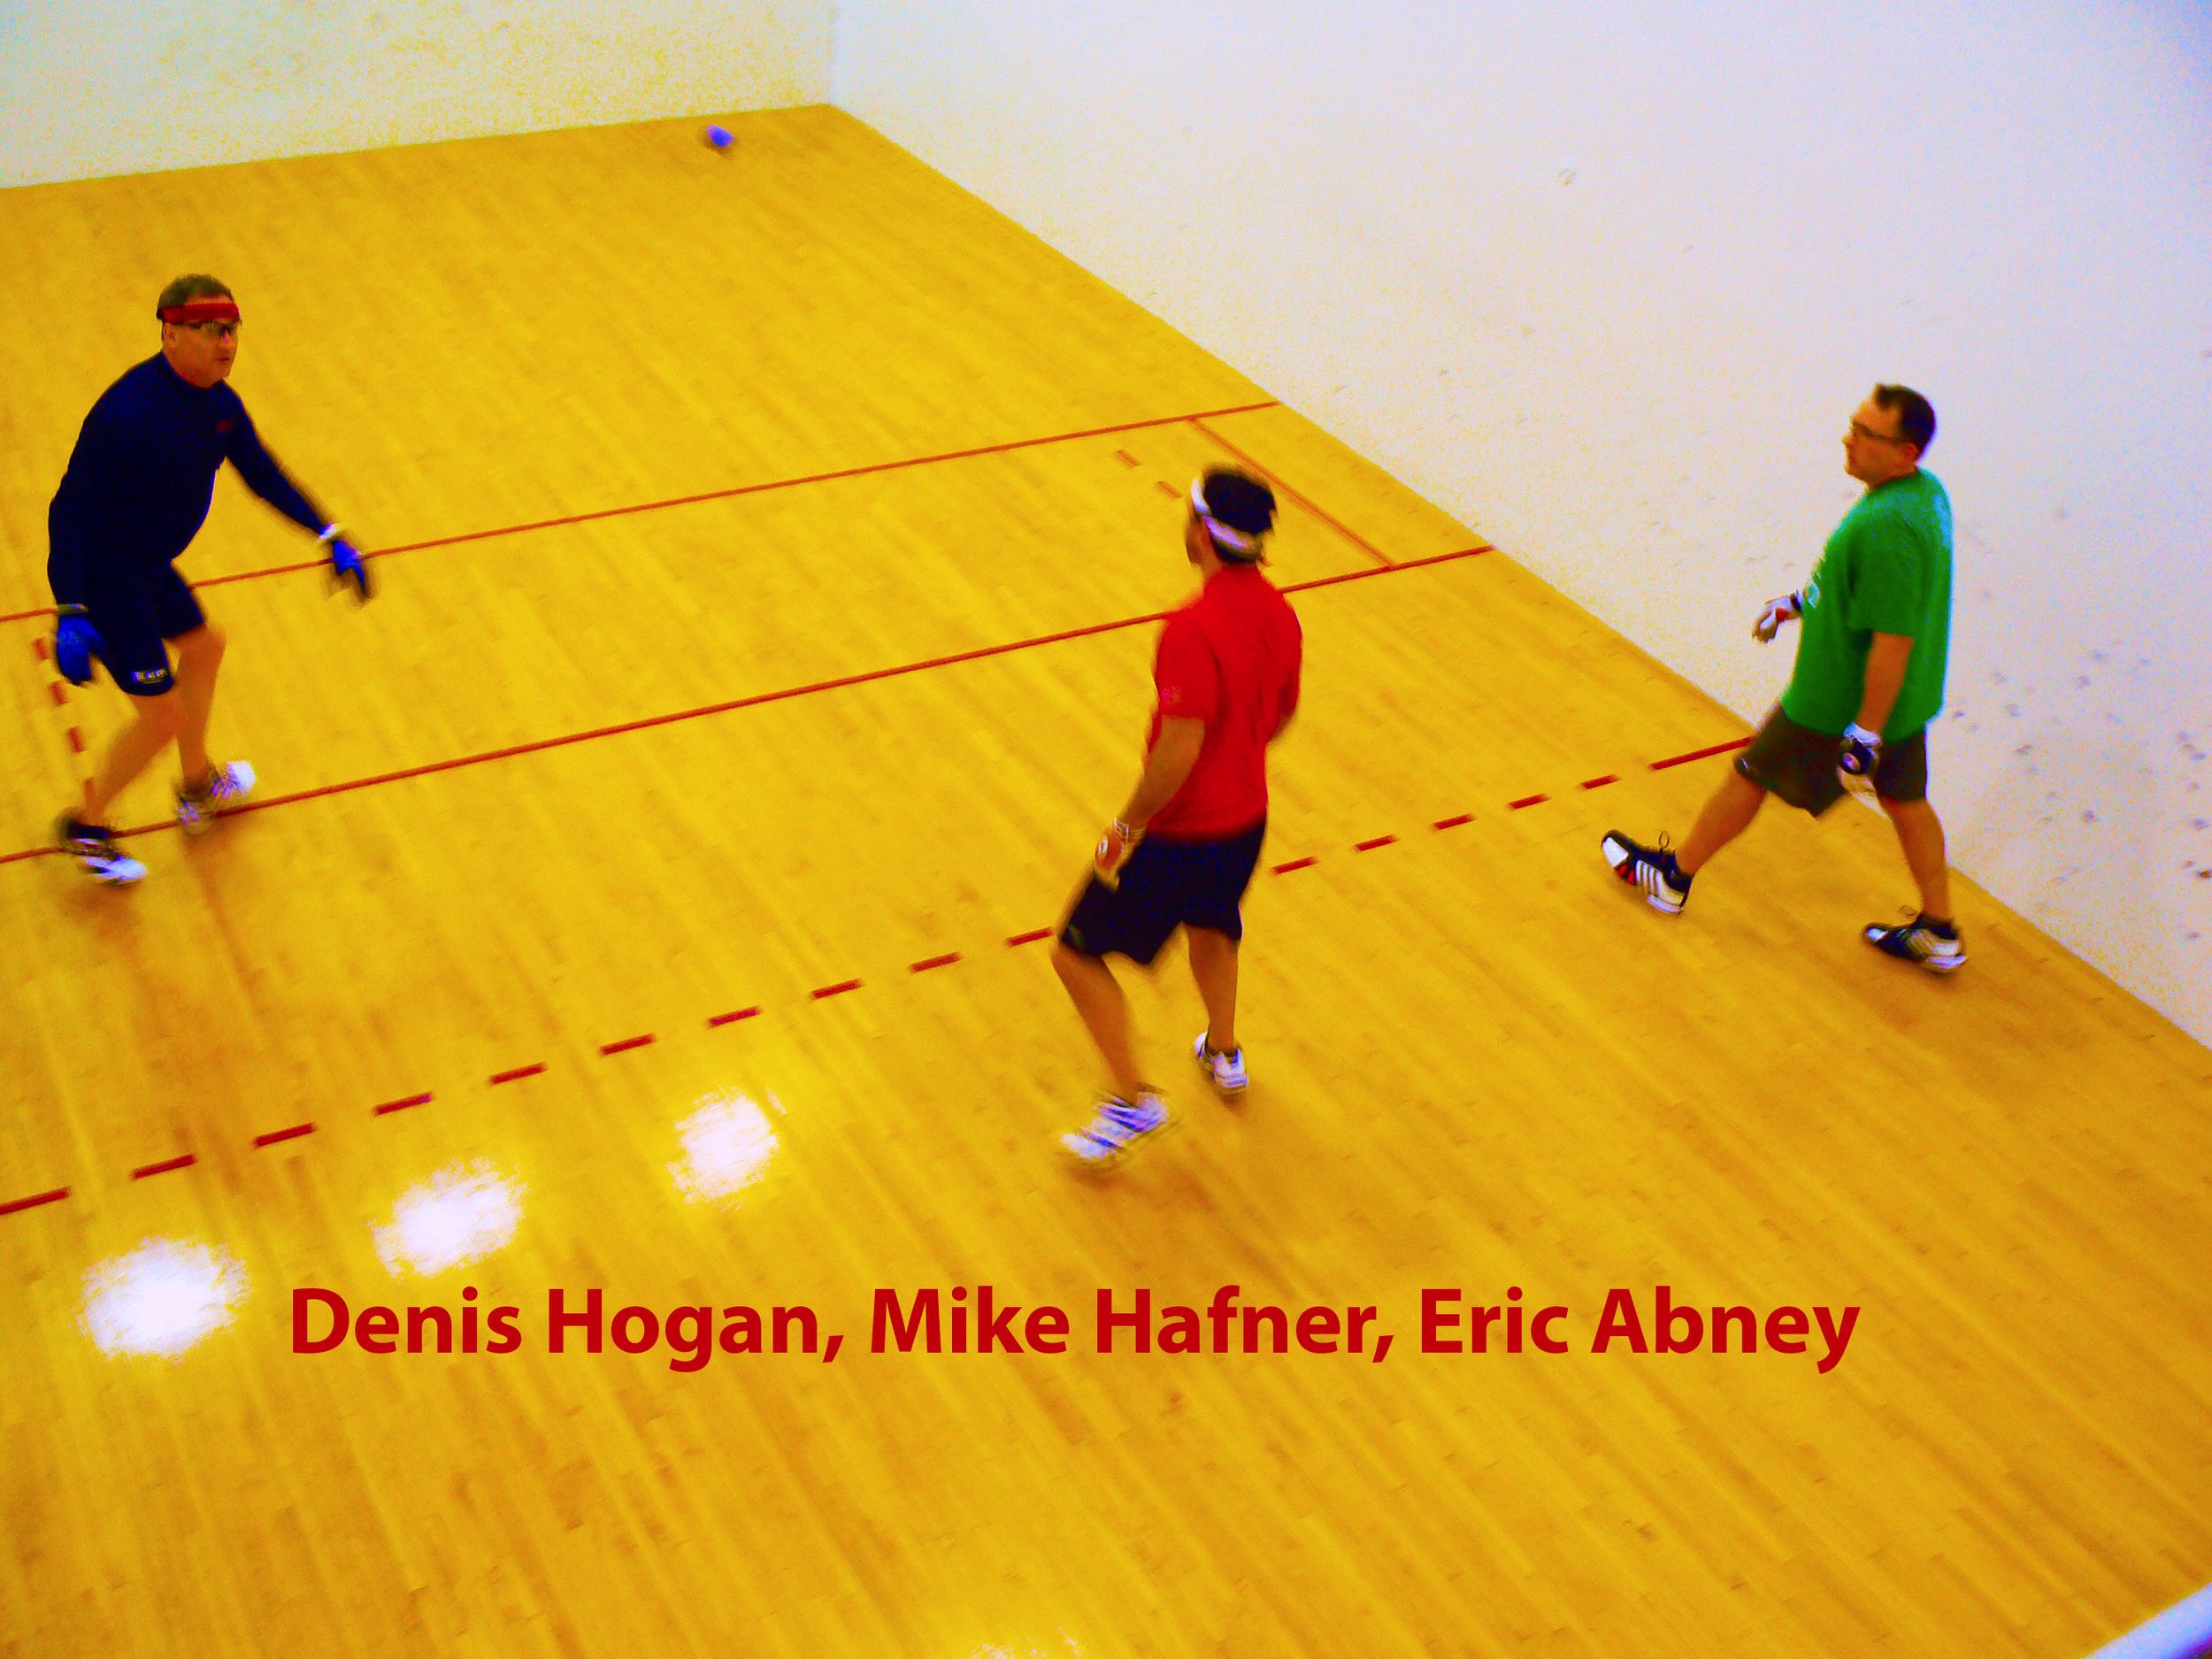 Denis Hogan, Mike Hafner, Eric Abney.png